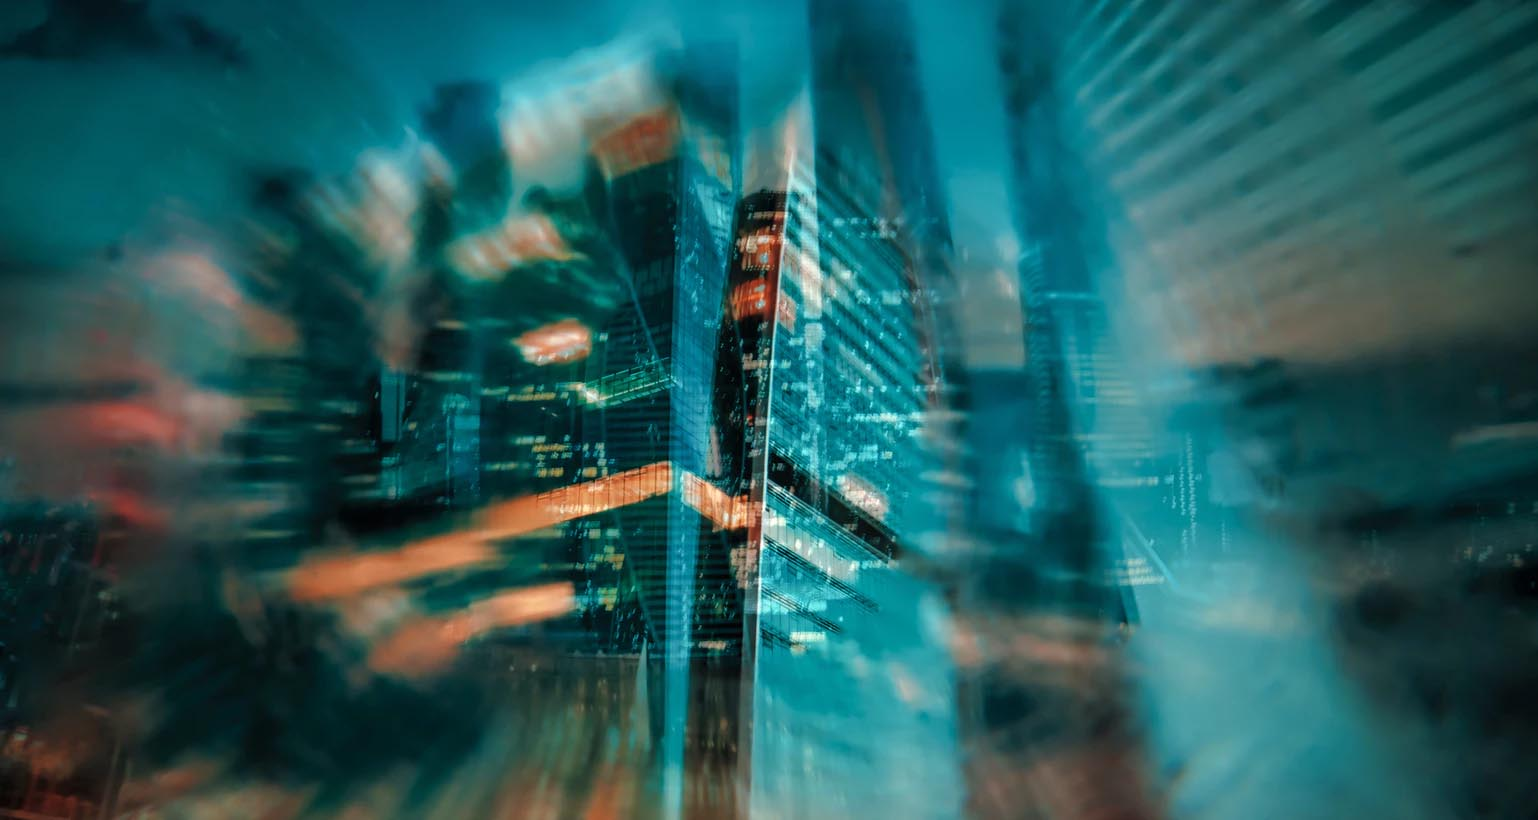 surreal_cityscape.jpg